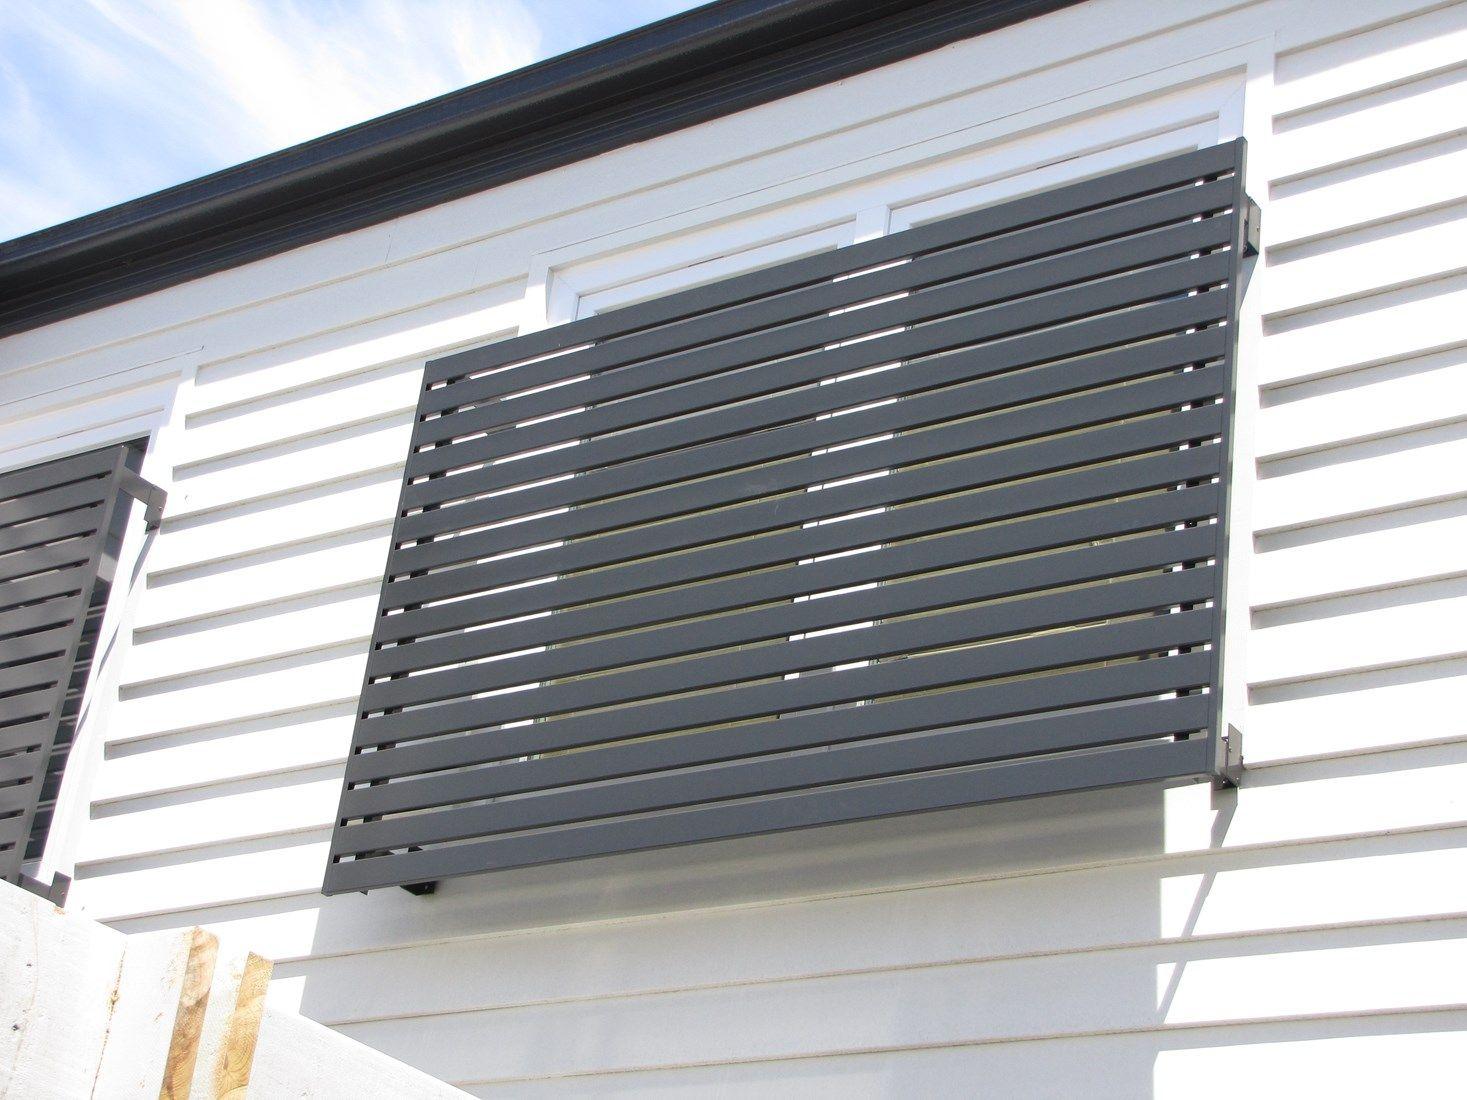 Bayside Privacy Screens Install Quality Aluminium Baton Style Window Screens Window Privacy Screen Window Privacy Window Screens